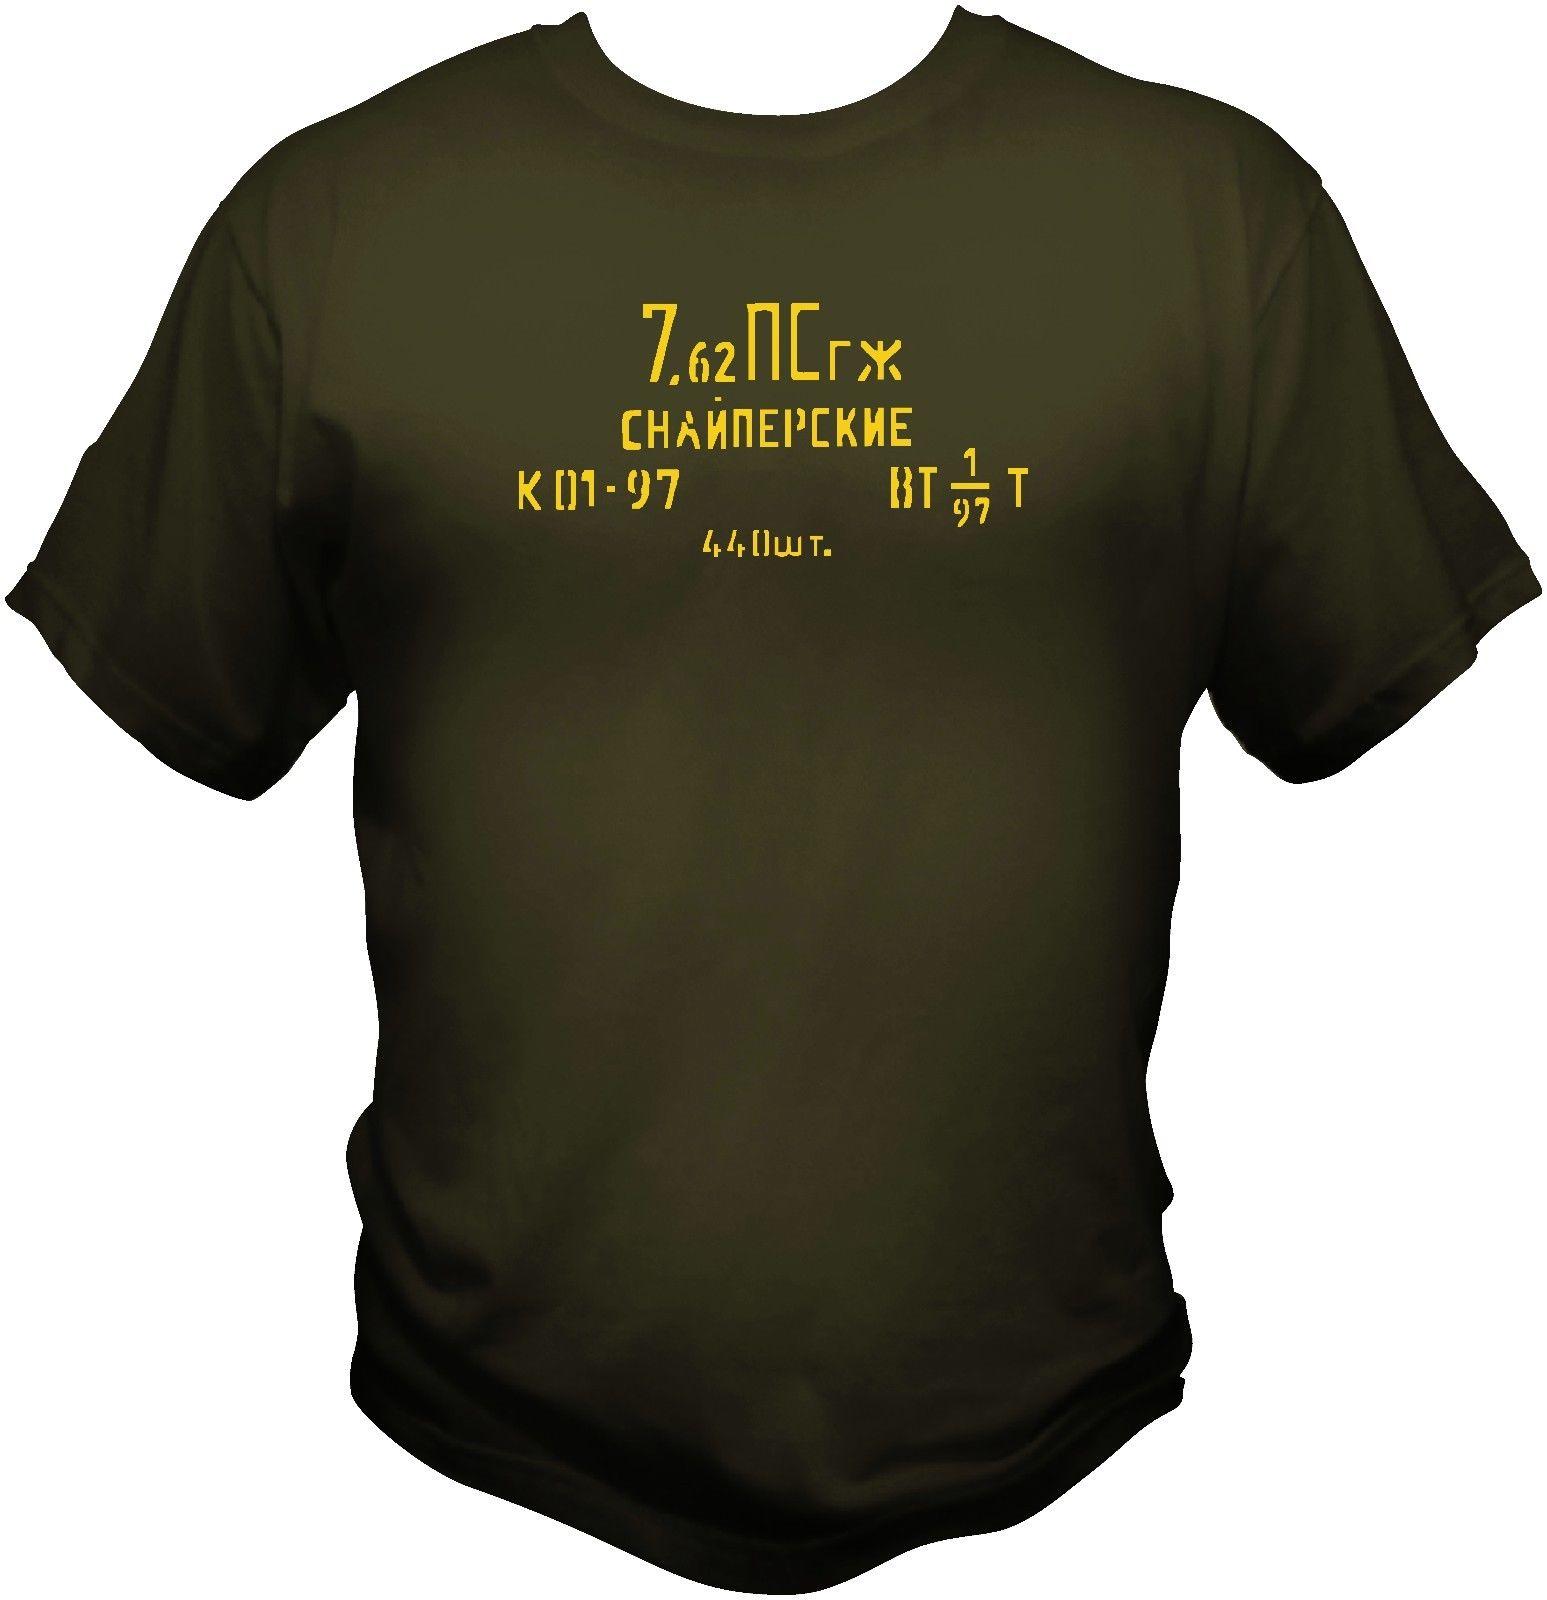 T-shirt Summer Hot Sale Men T-shirt Russian 7.62 X 54 Mosin Nagant Ammo Can T shirt Sling Stock M44 M91/30 bayonet